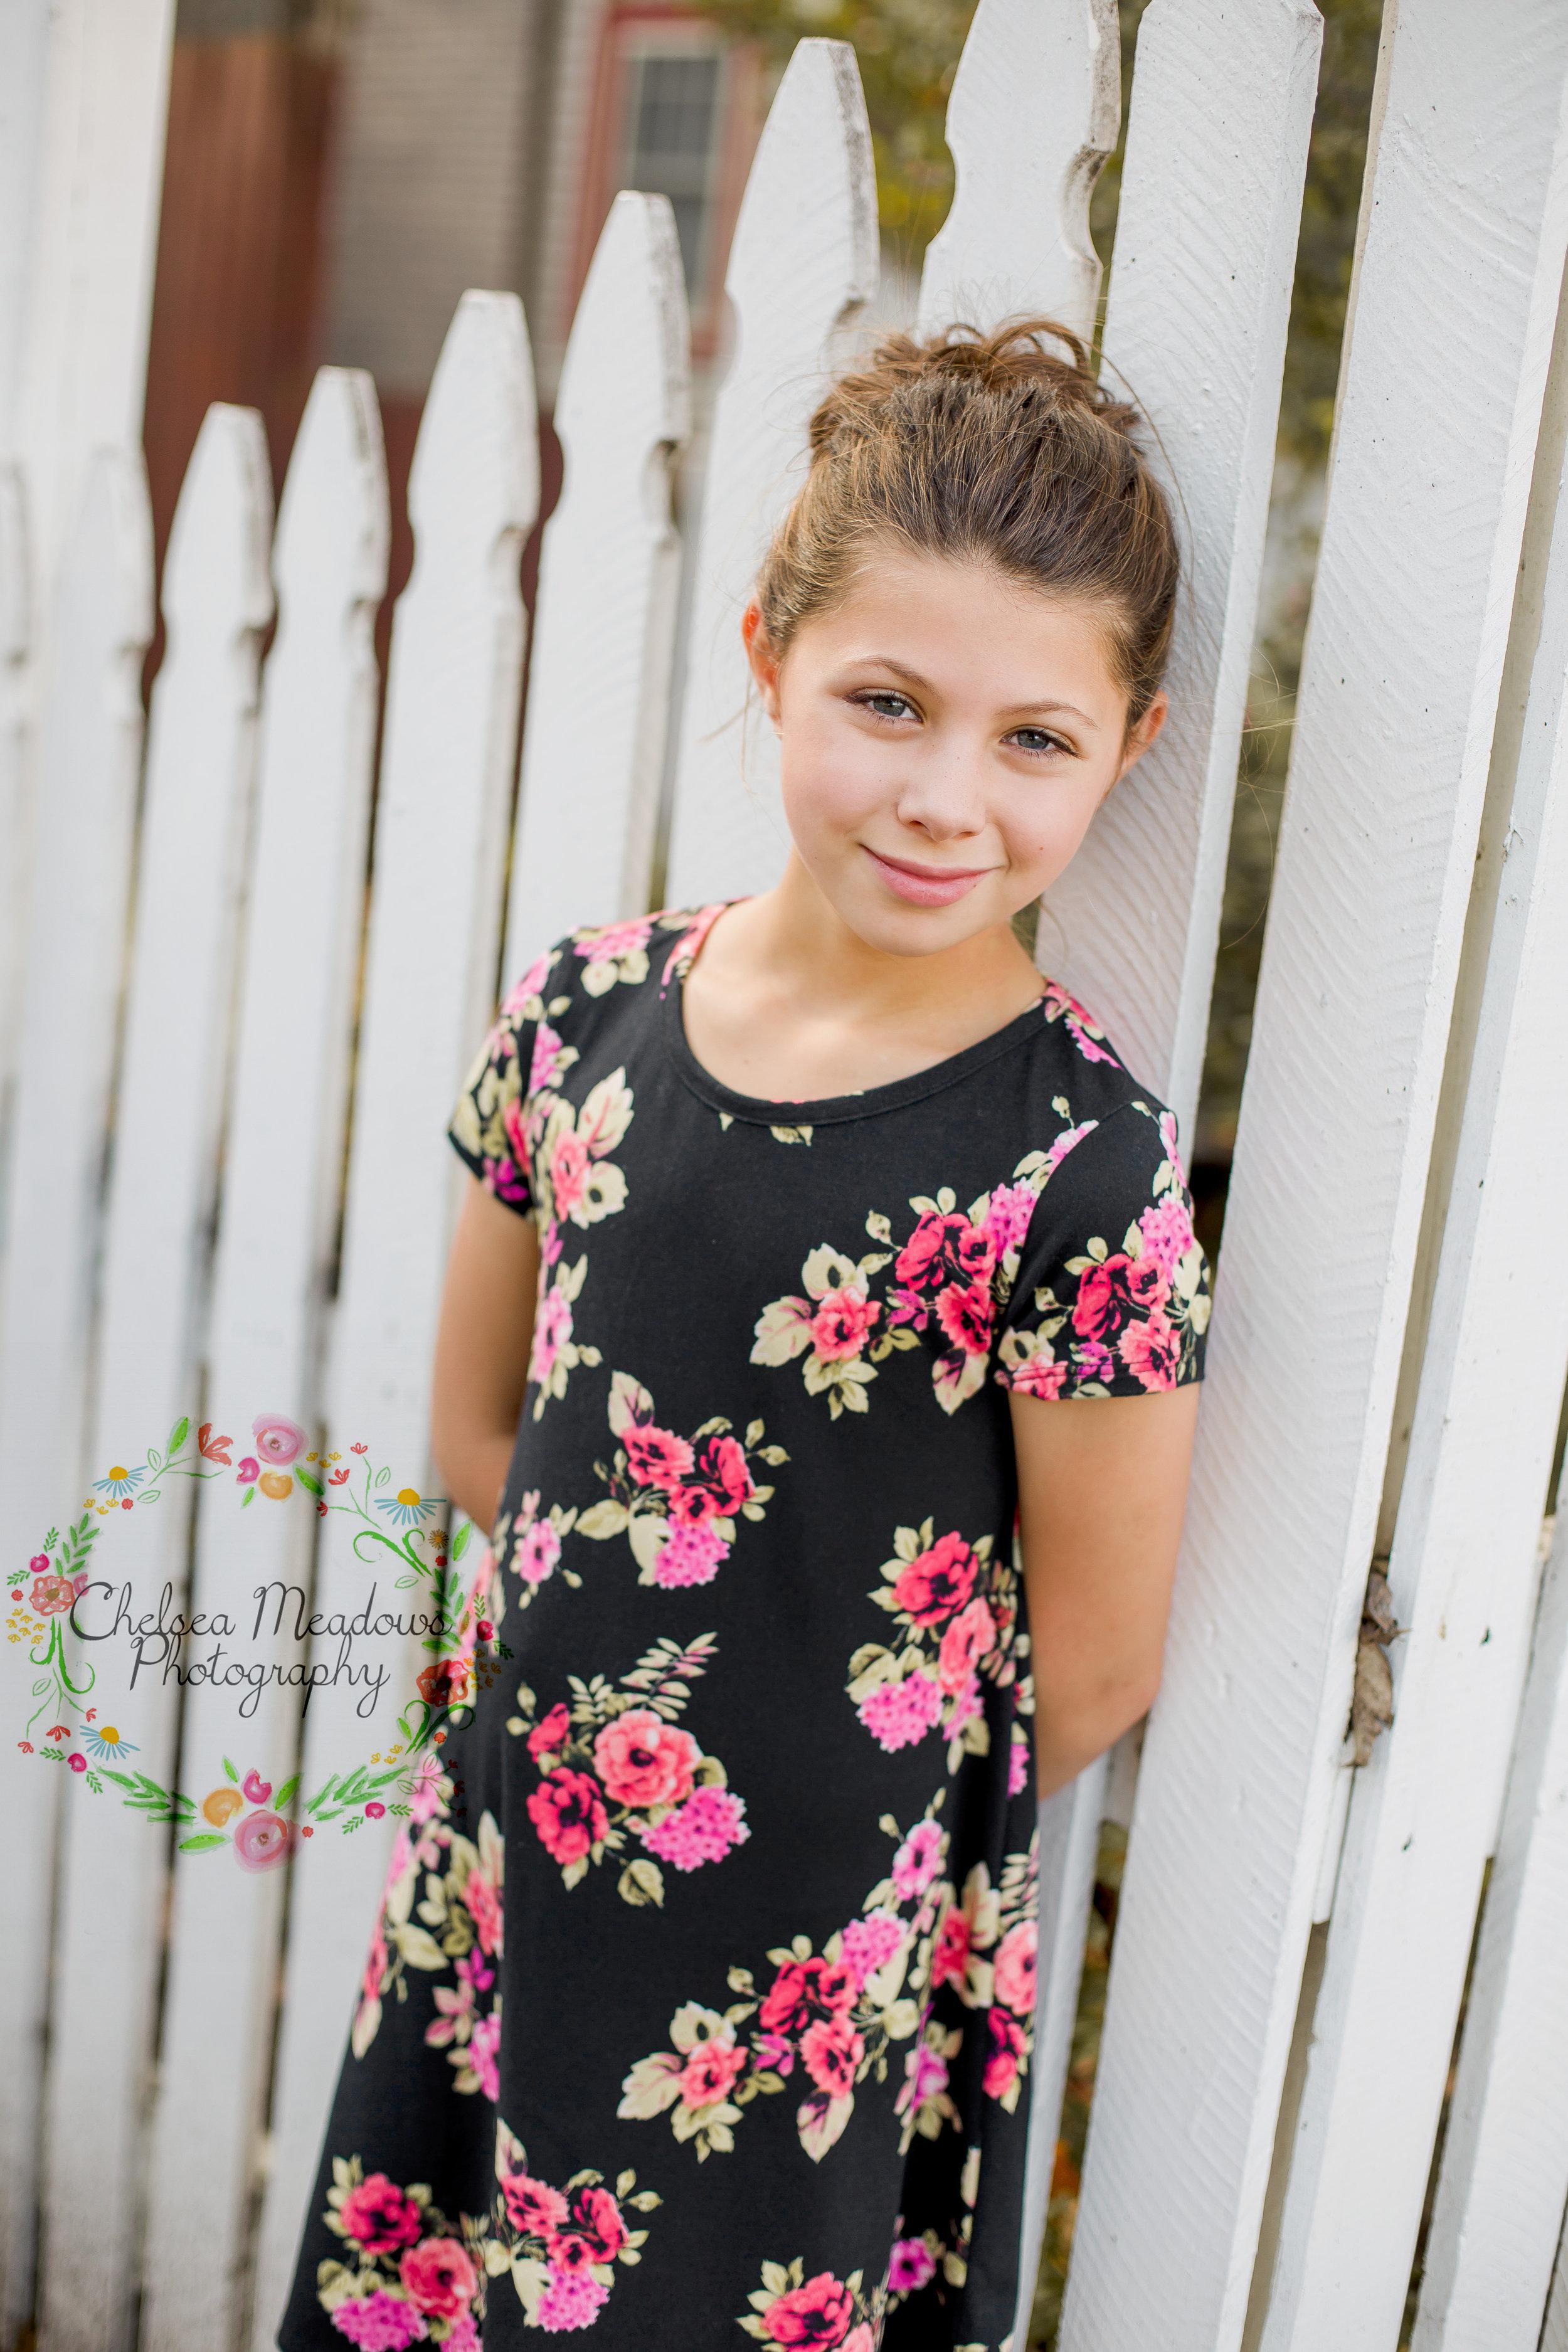 Shannon Family Session - Nashville Family Photographer - Chelsea Meadows Photography (69).jpg